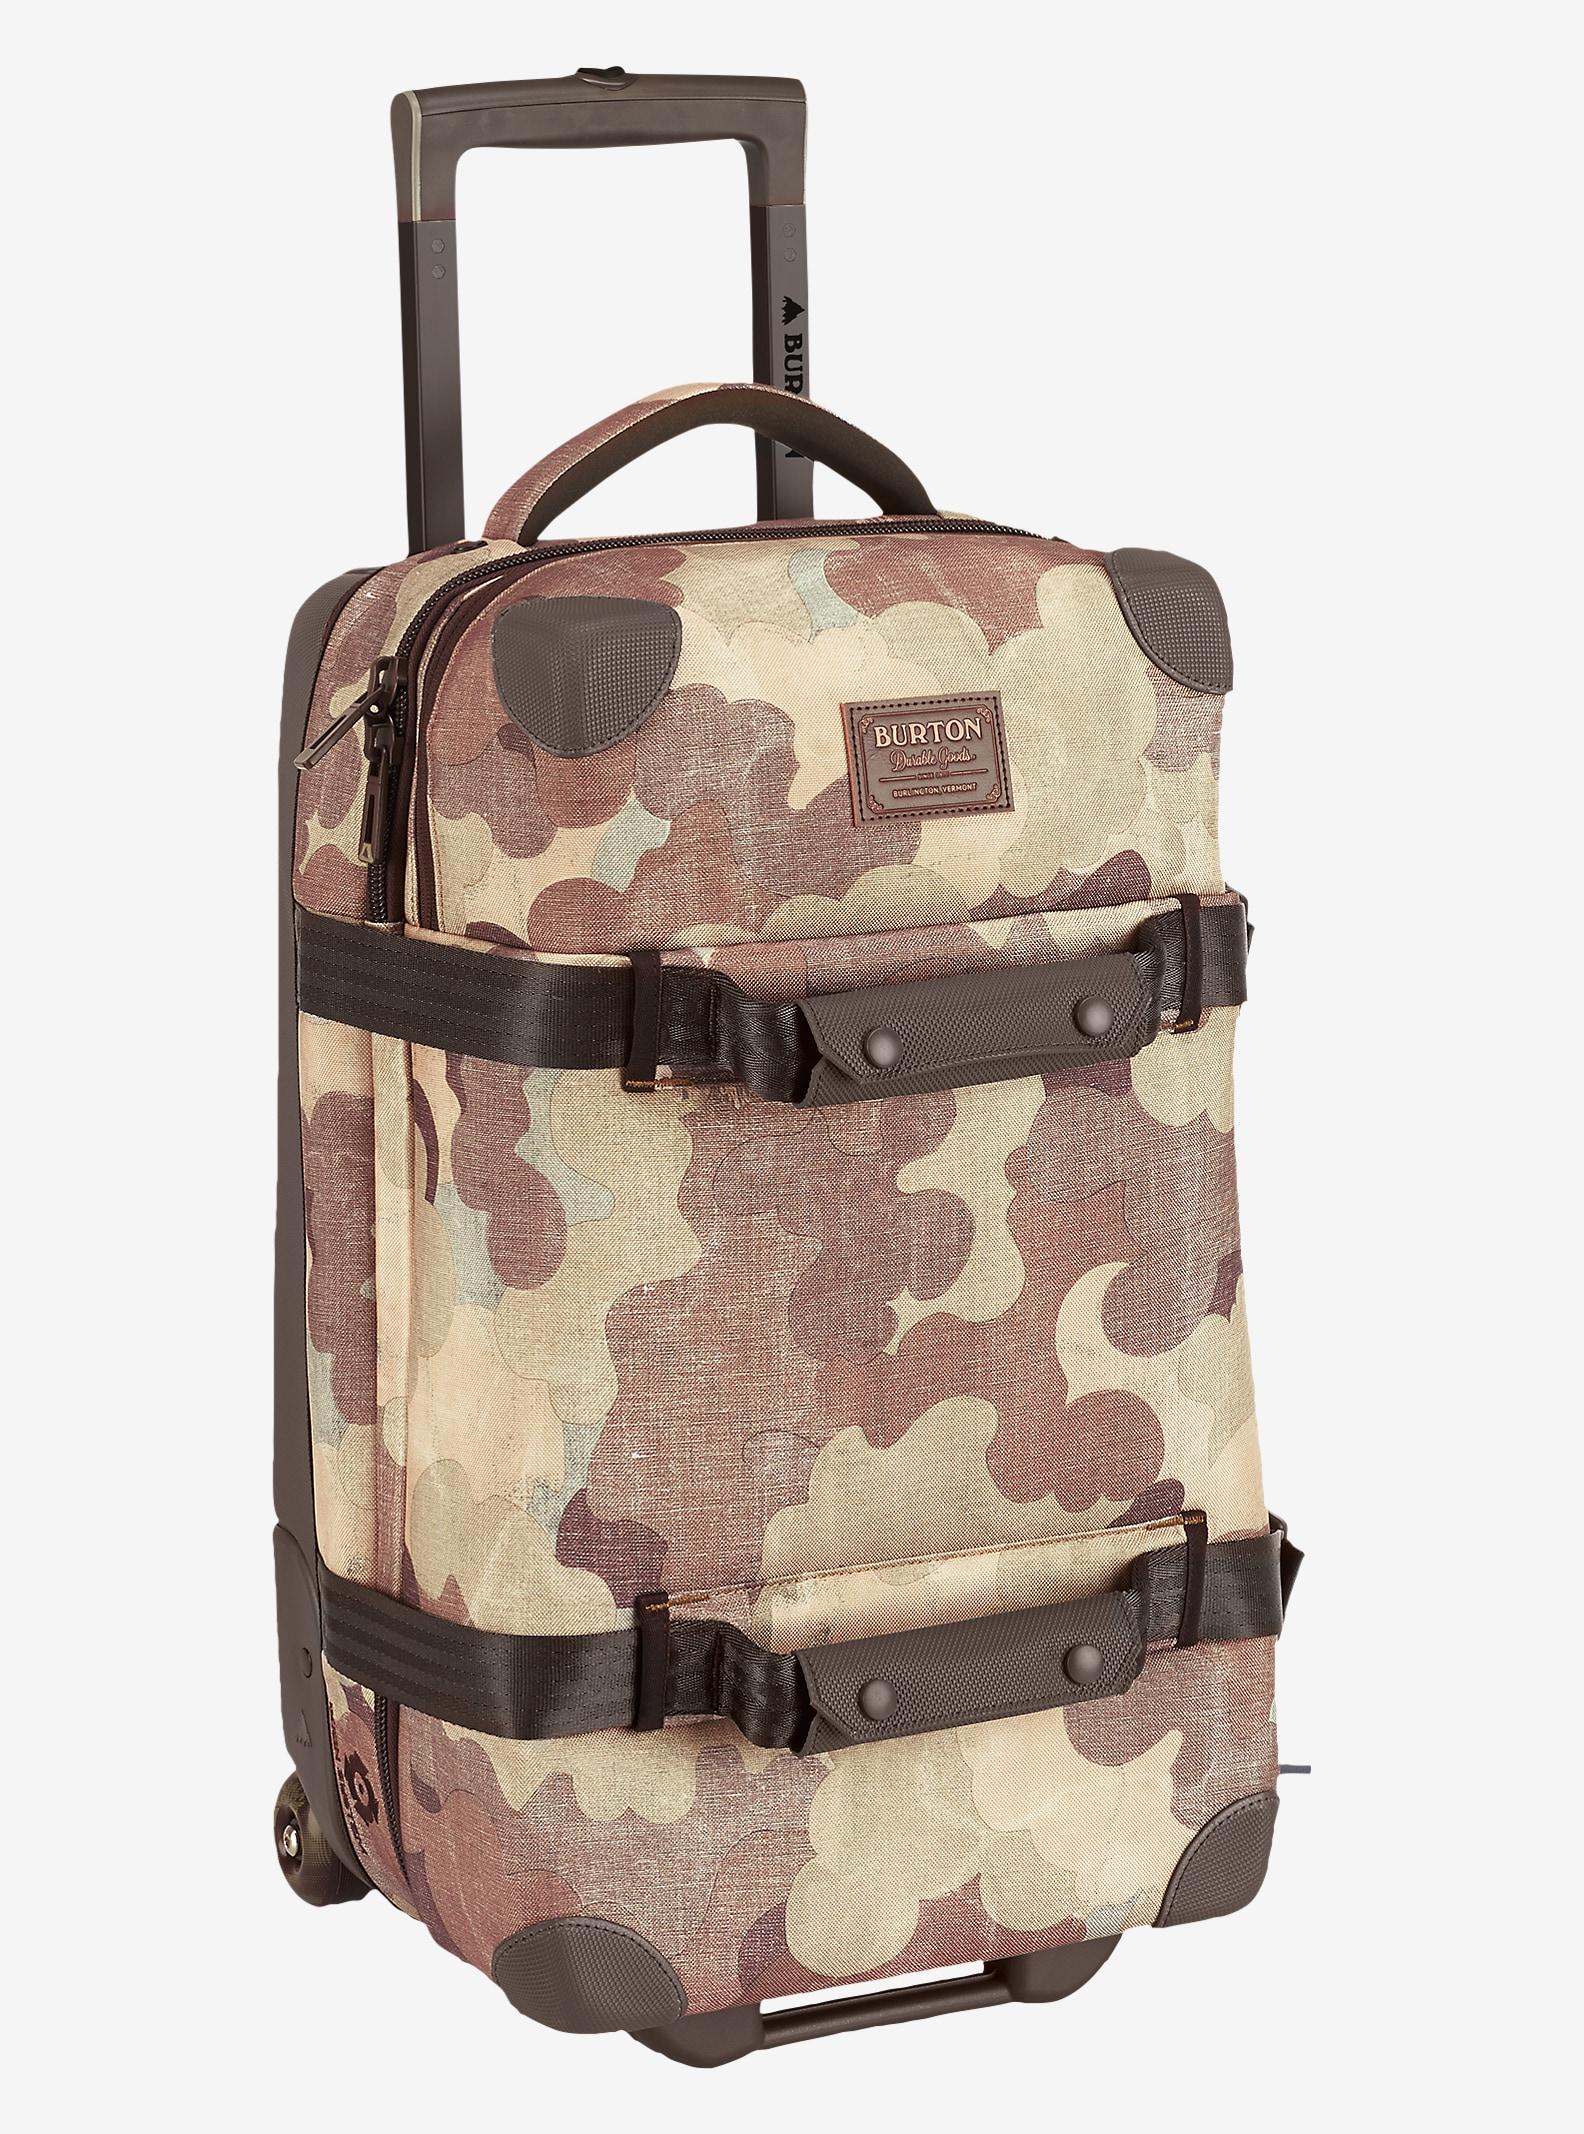 Burton Wheelie Flight Deck Travel Bag shown in Storm Camo Print